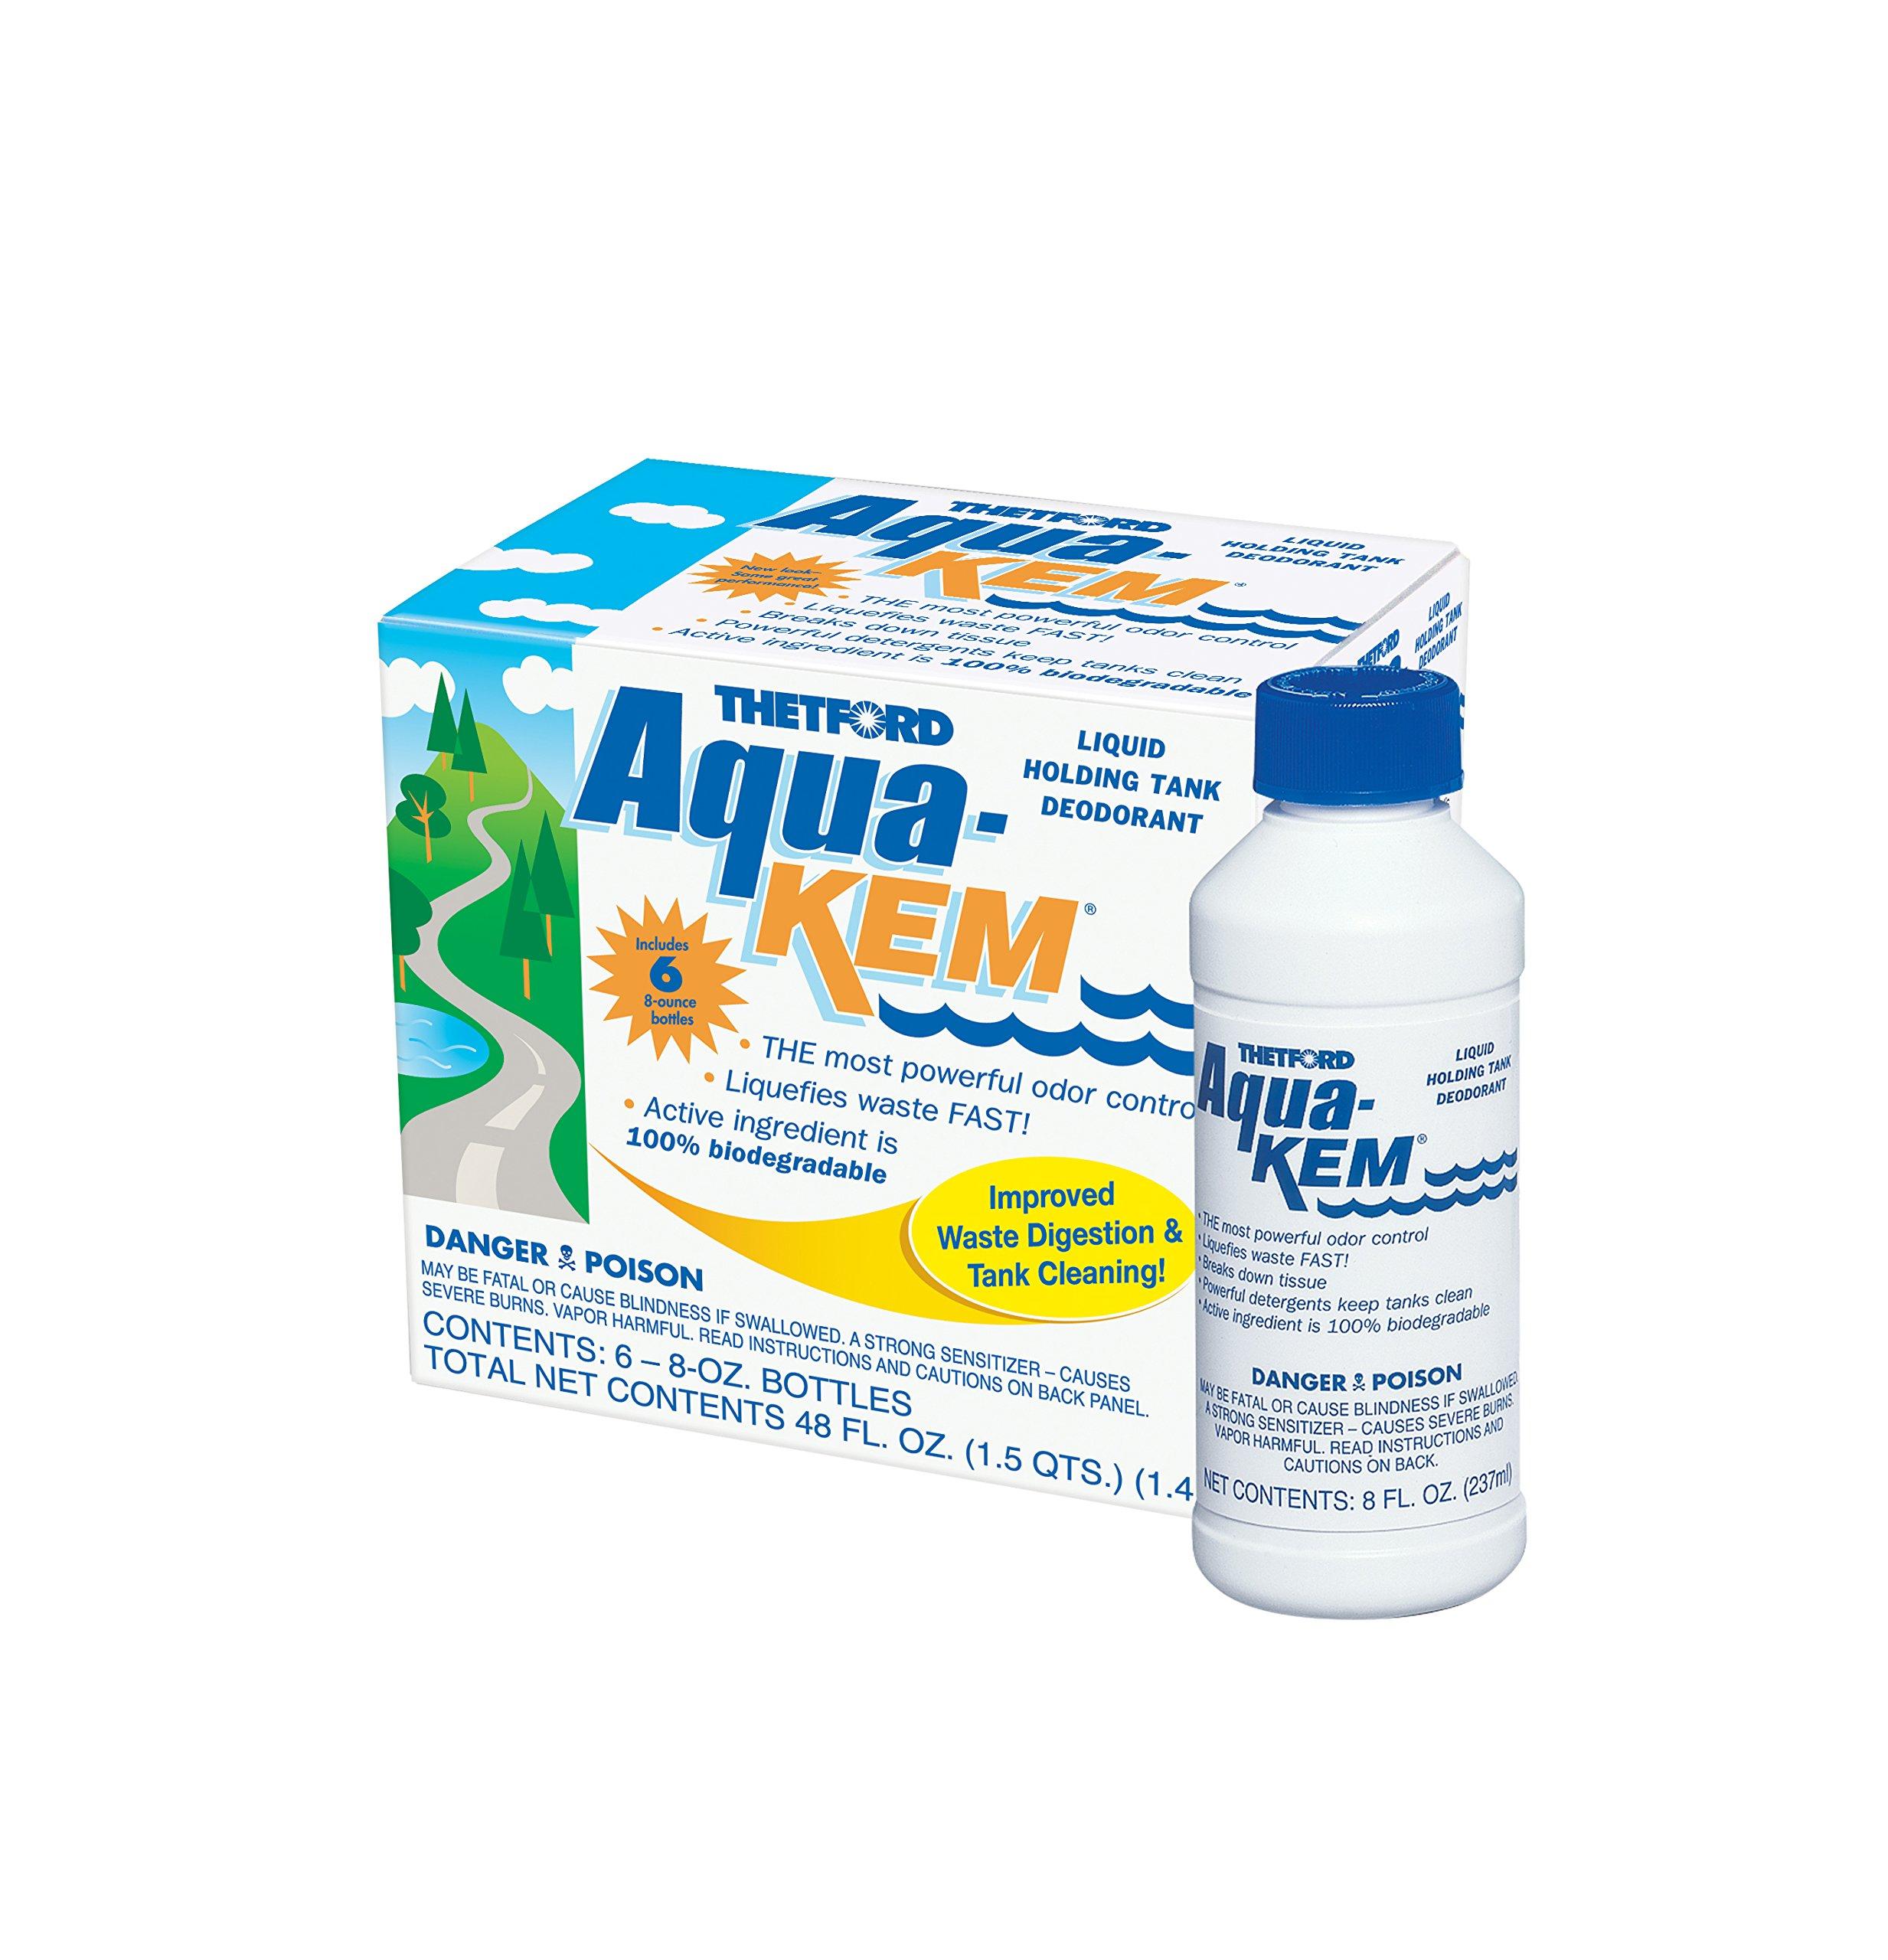 Thetford 10801 Aqua-KEM Original-Holding Tank Treatment-Deodorizer-Waste Digester-Detergent - 8 Ounce Bottles 6 Pack by Thetford